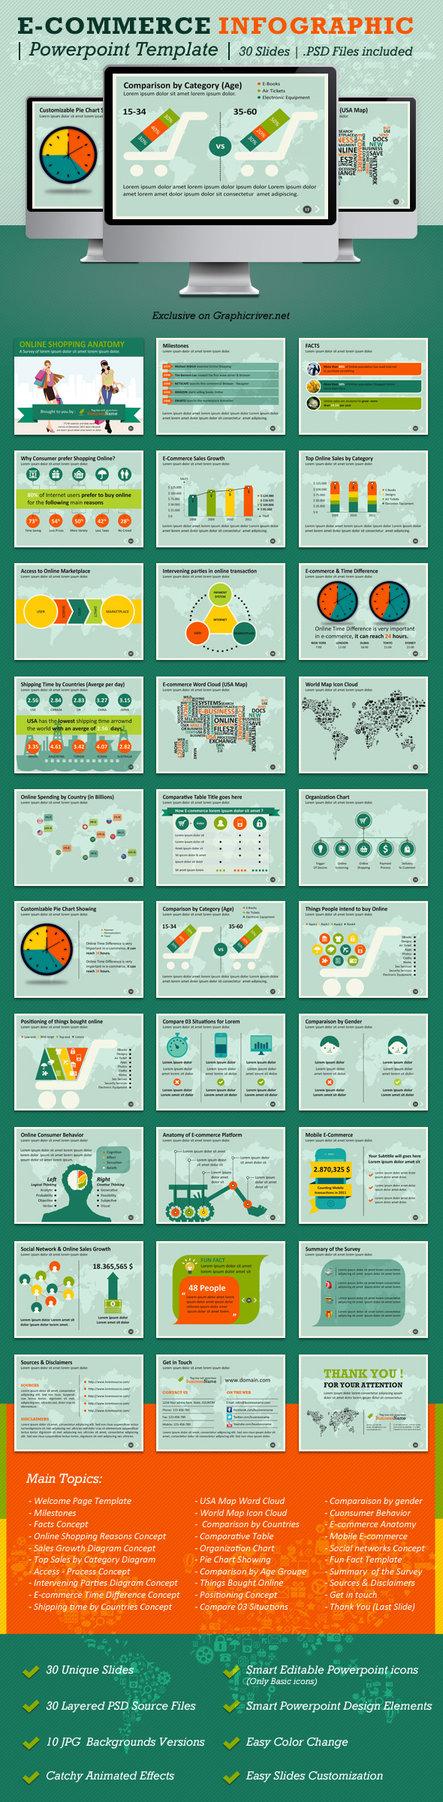 Infographic Survey Powerpoint Template By Kh On DeviantArt - Survey presentation template